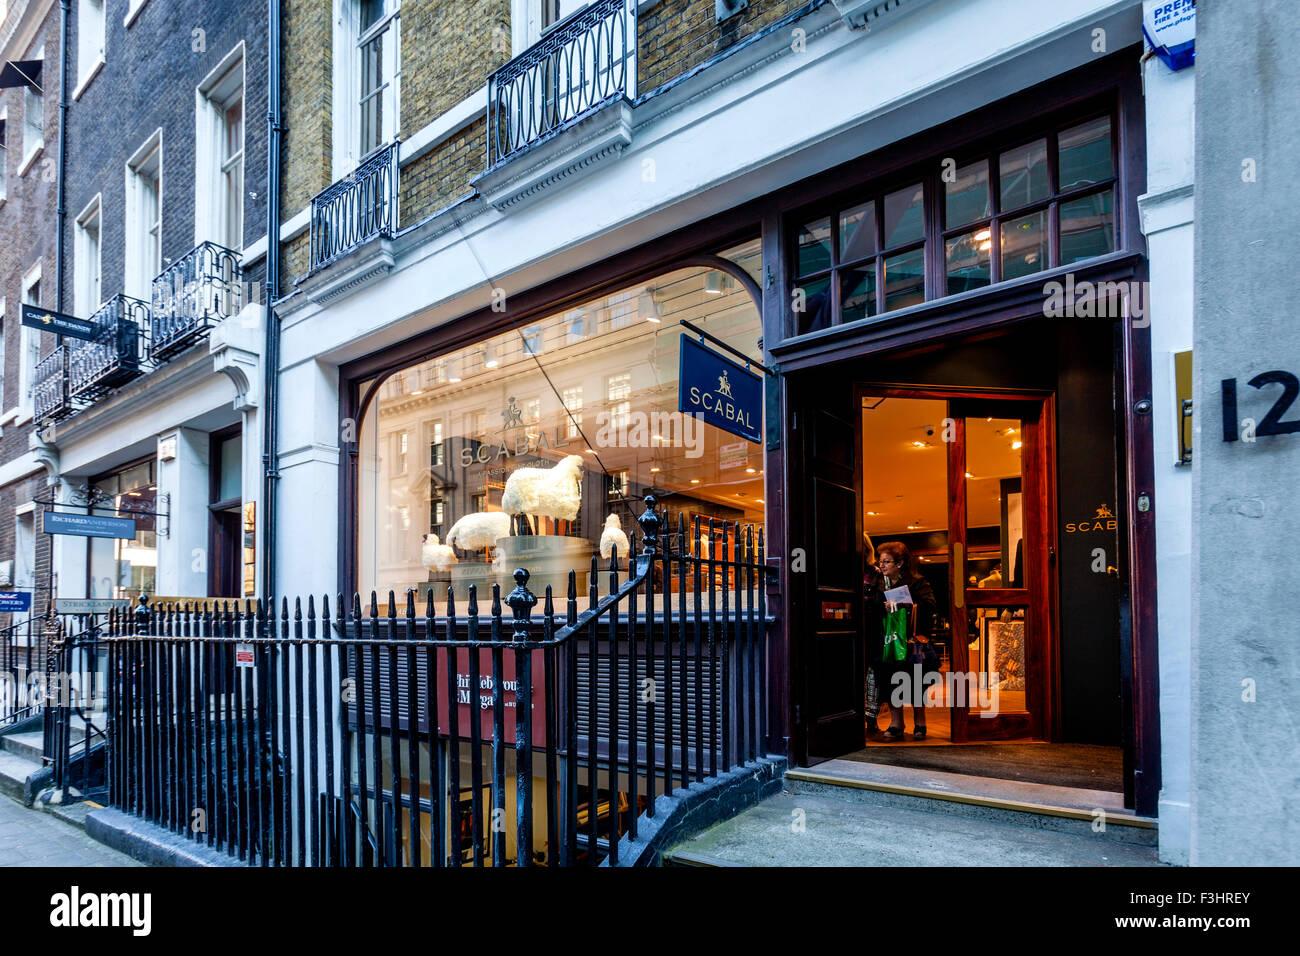 Scabal Tailors, Savile Row, London, UK Stock Photo ...